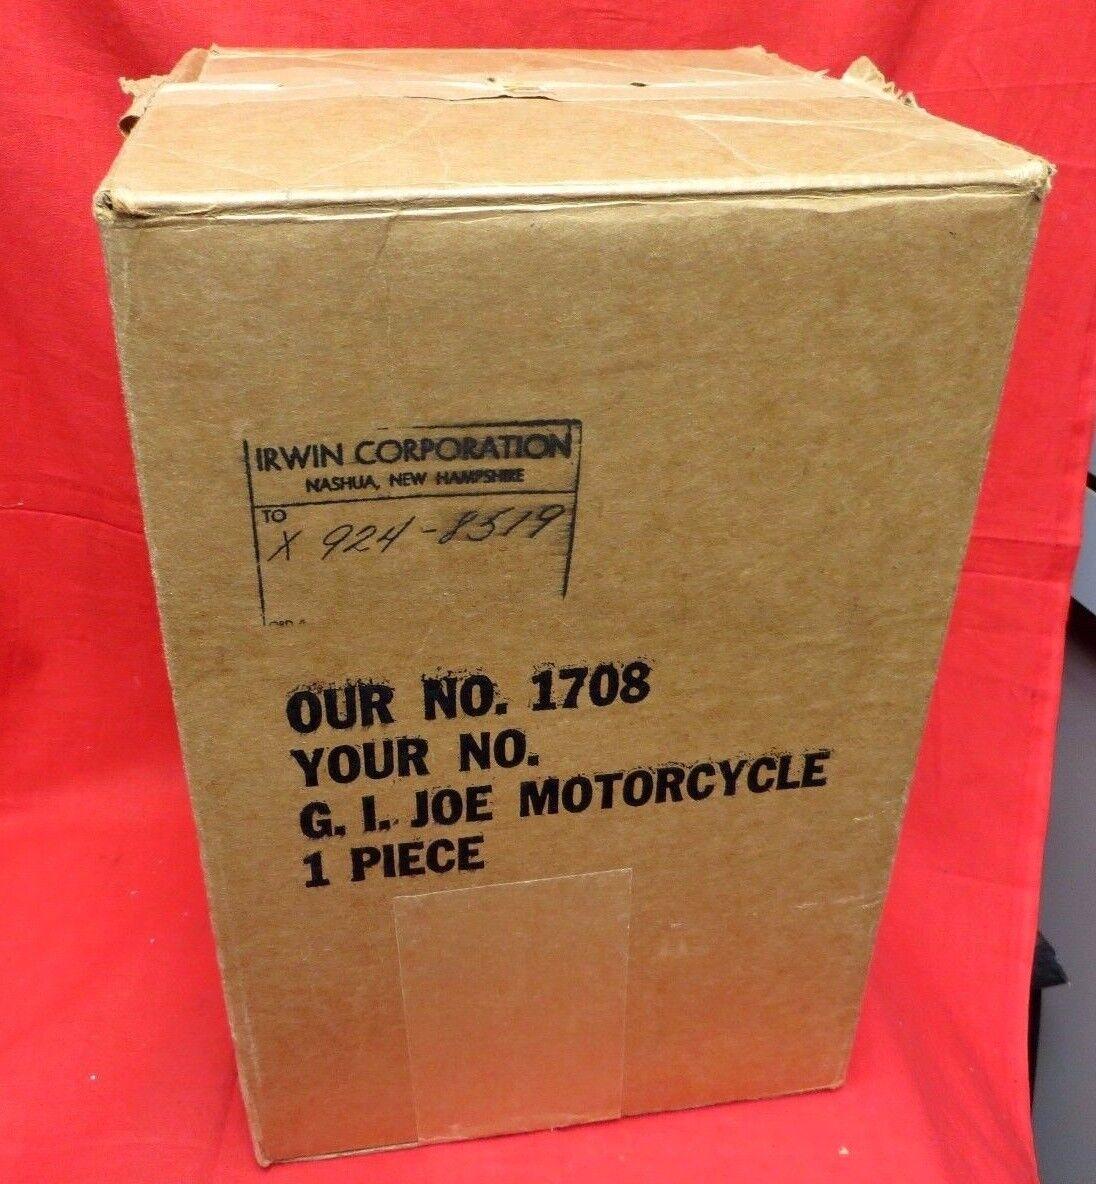 1964 VINTAGE GI JOE JOEZETA  SOTW IRWIN     EMPTY MAIL ORDER CATALOG SHIPPING scatola  migliore offerta